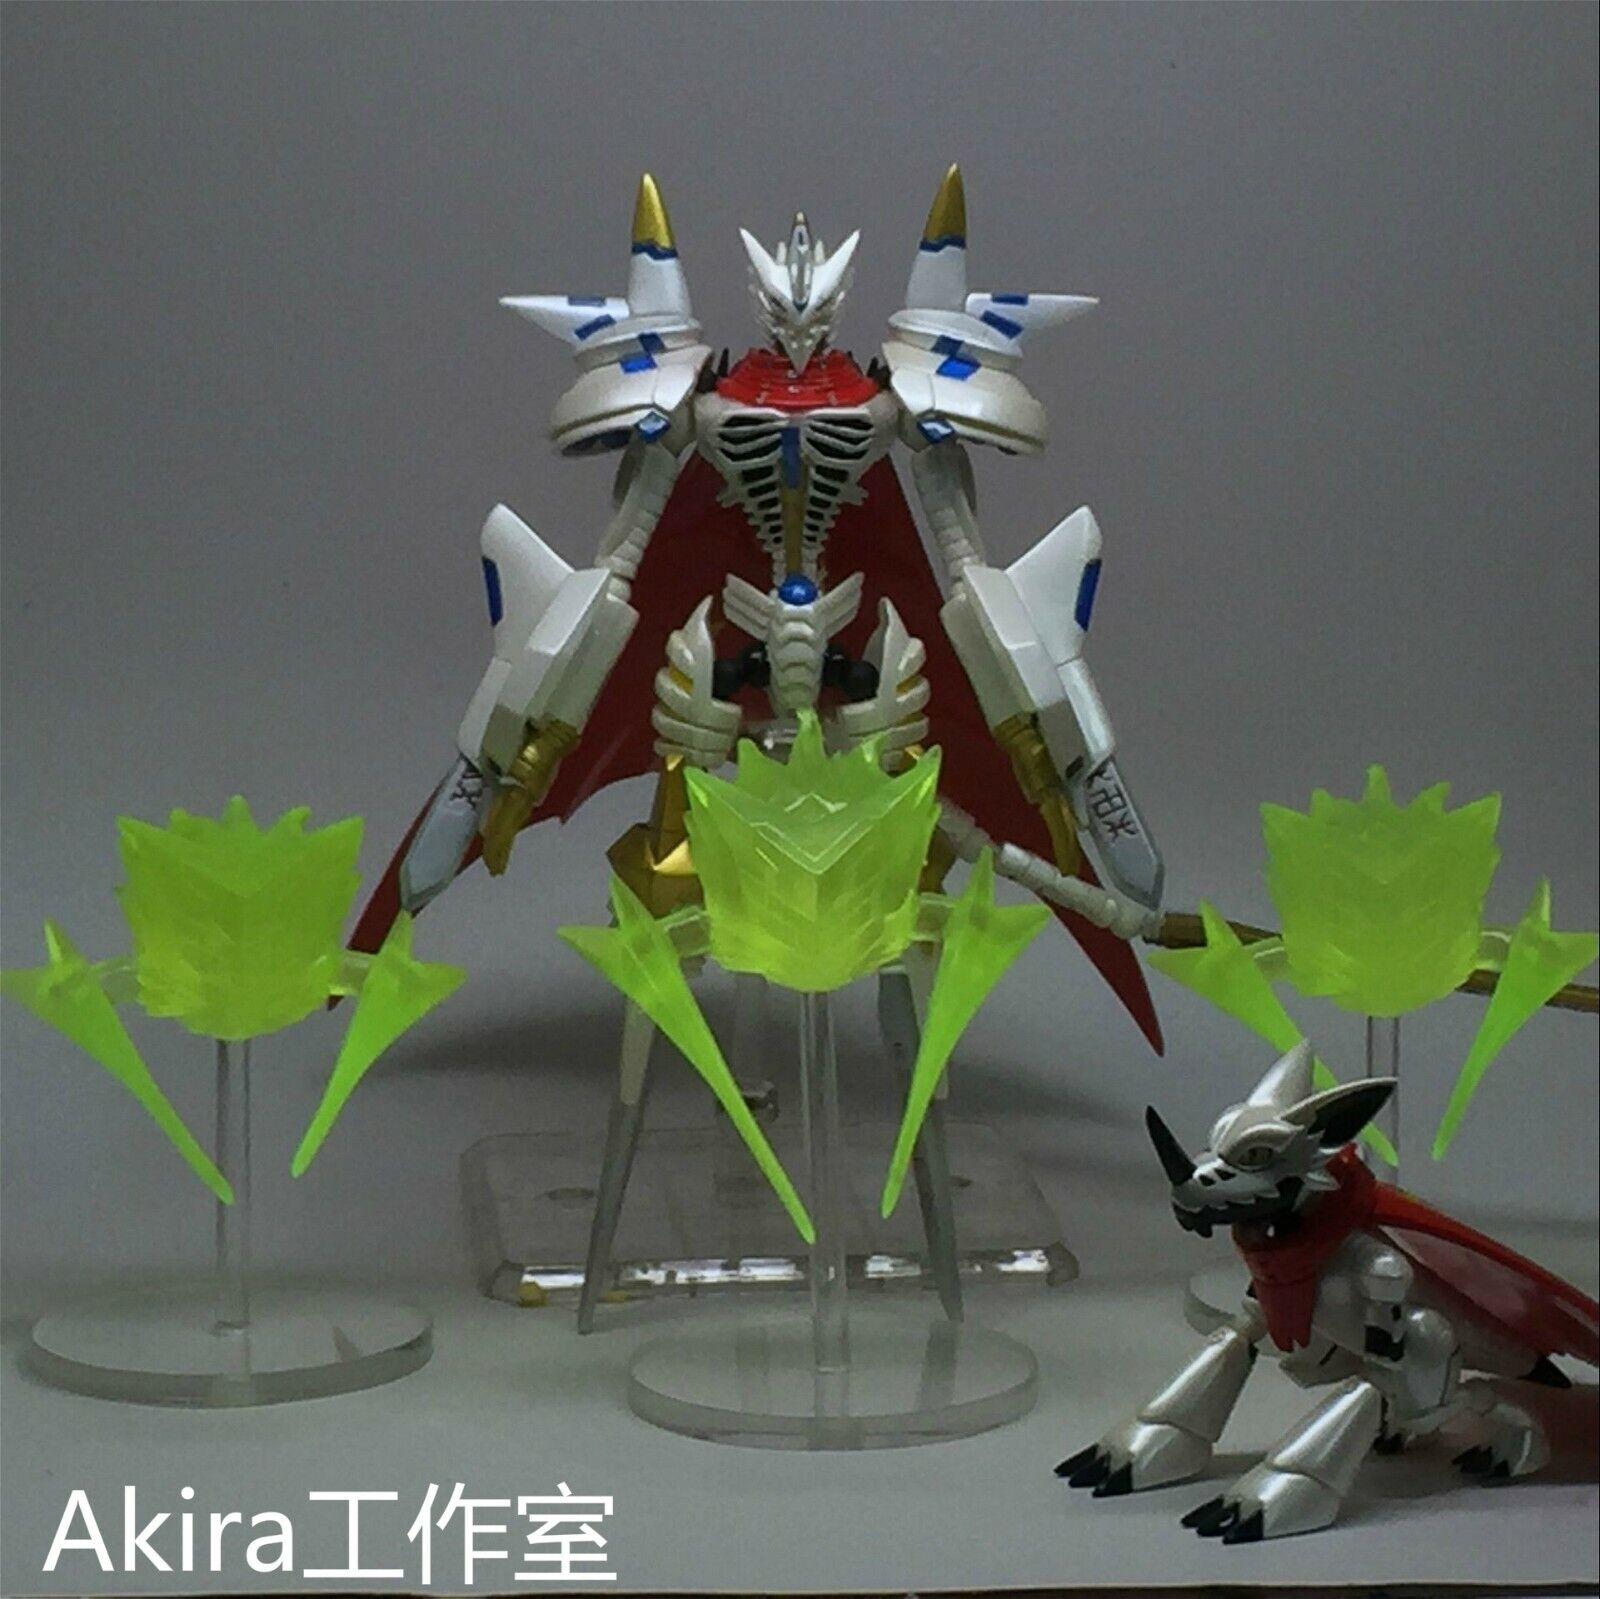 Spielzeug Akira Studio Digimon Adventure Royal Knights Jesmon Resin Figure Statue Gk N Triadecont Com Br Crimson mode (jogress with dukemon). triadecont com br